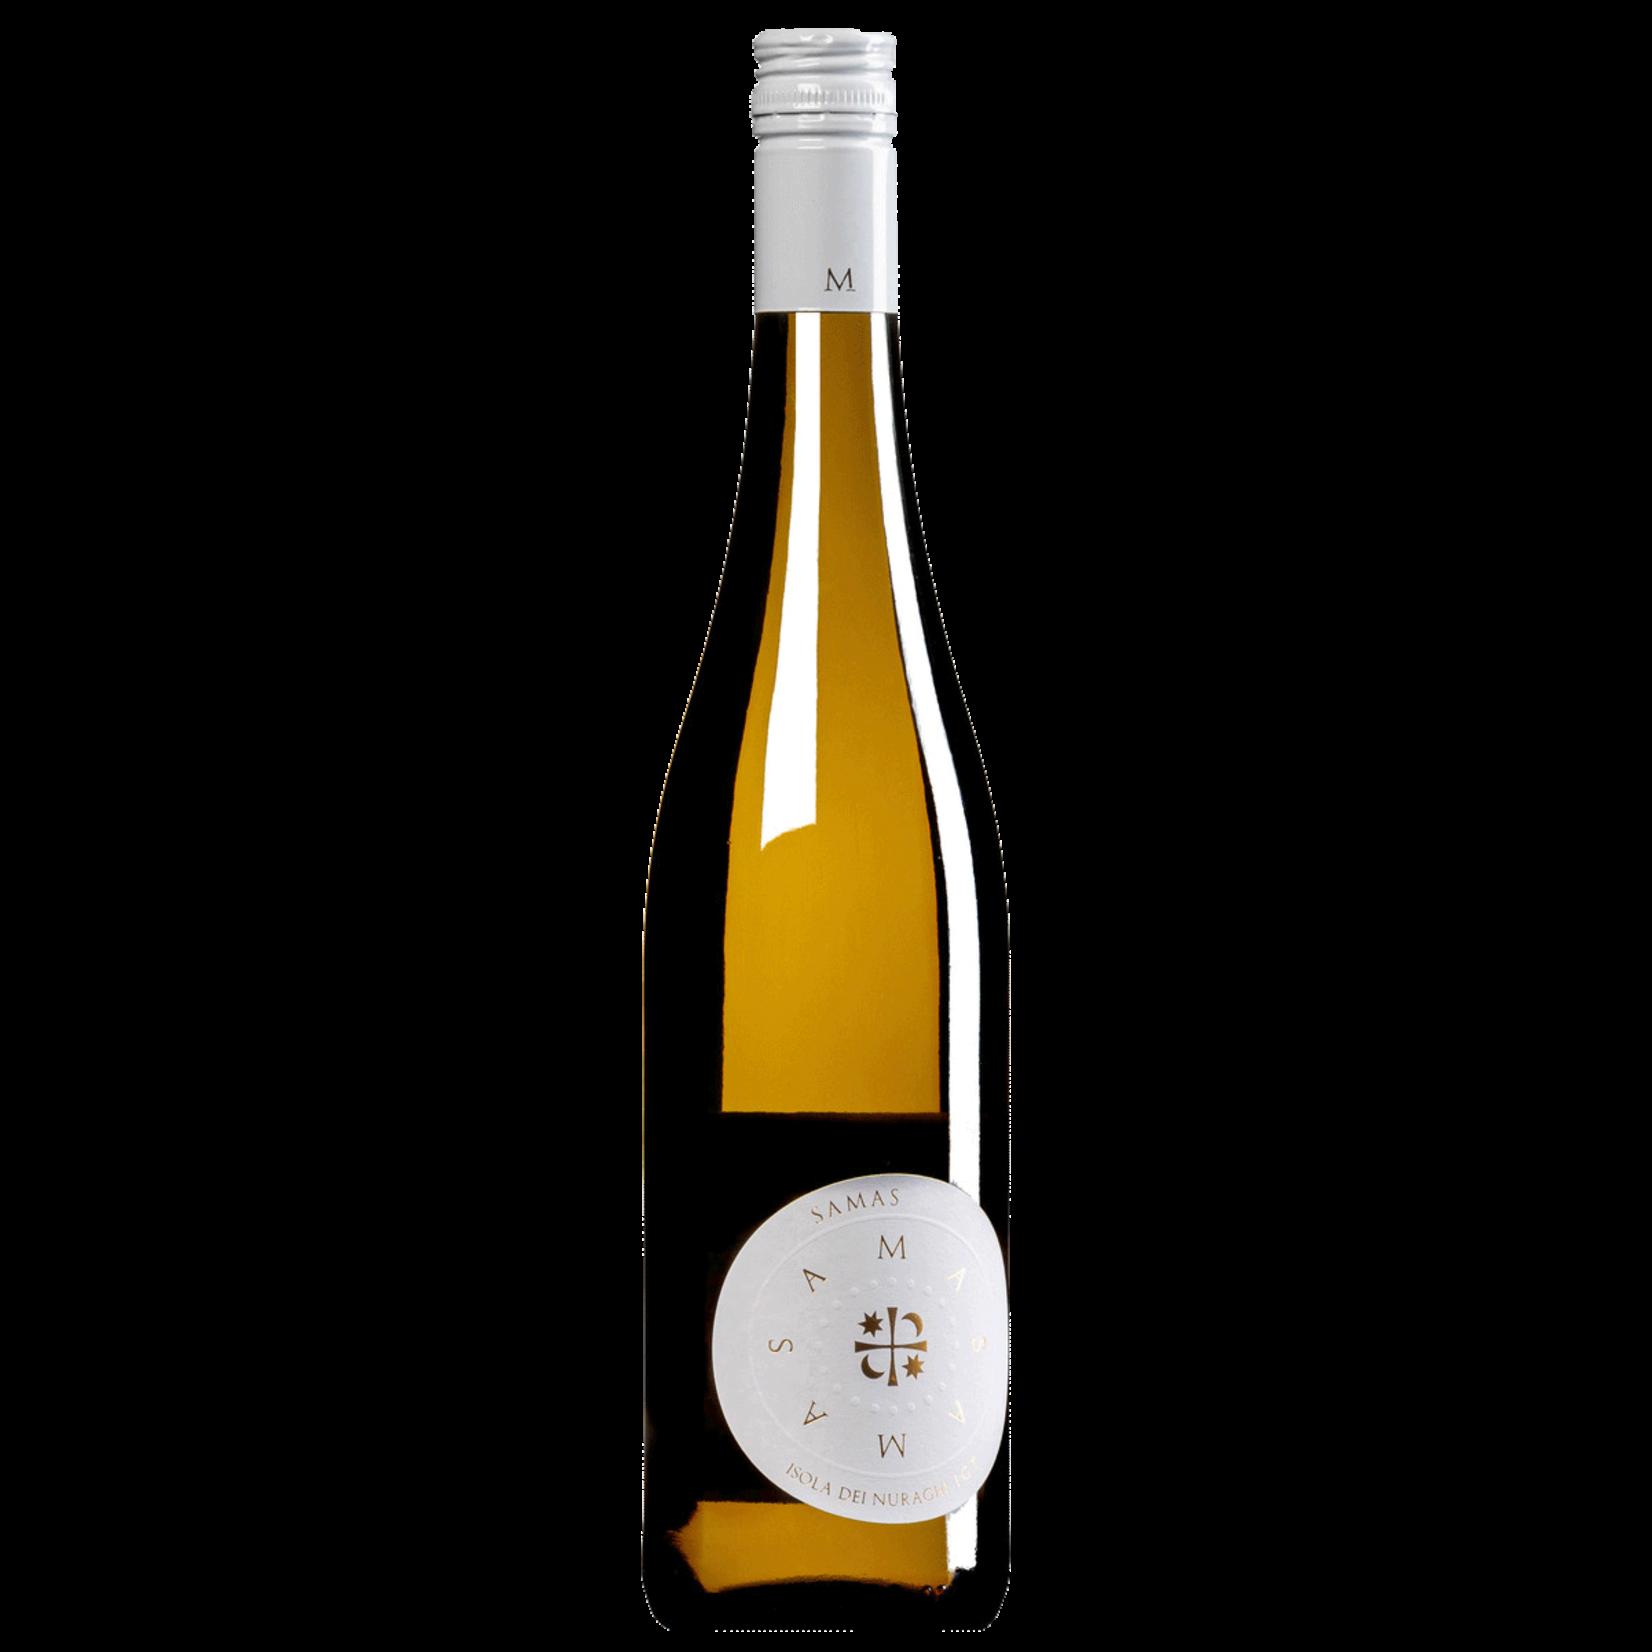 Wine Agricola Punica Isola Dei Nuraghi Samas 2020